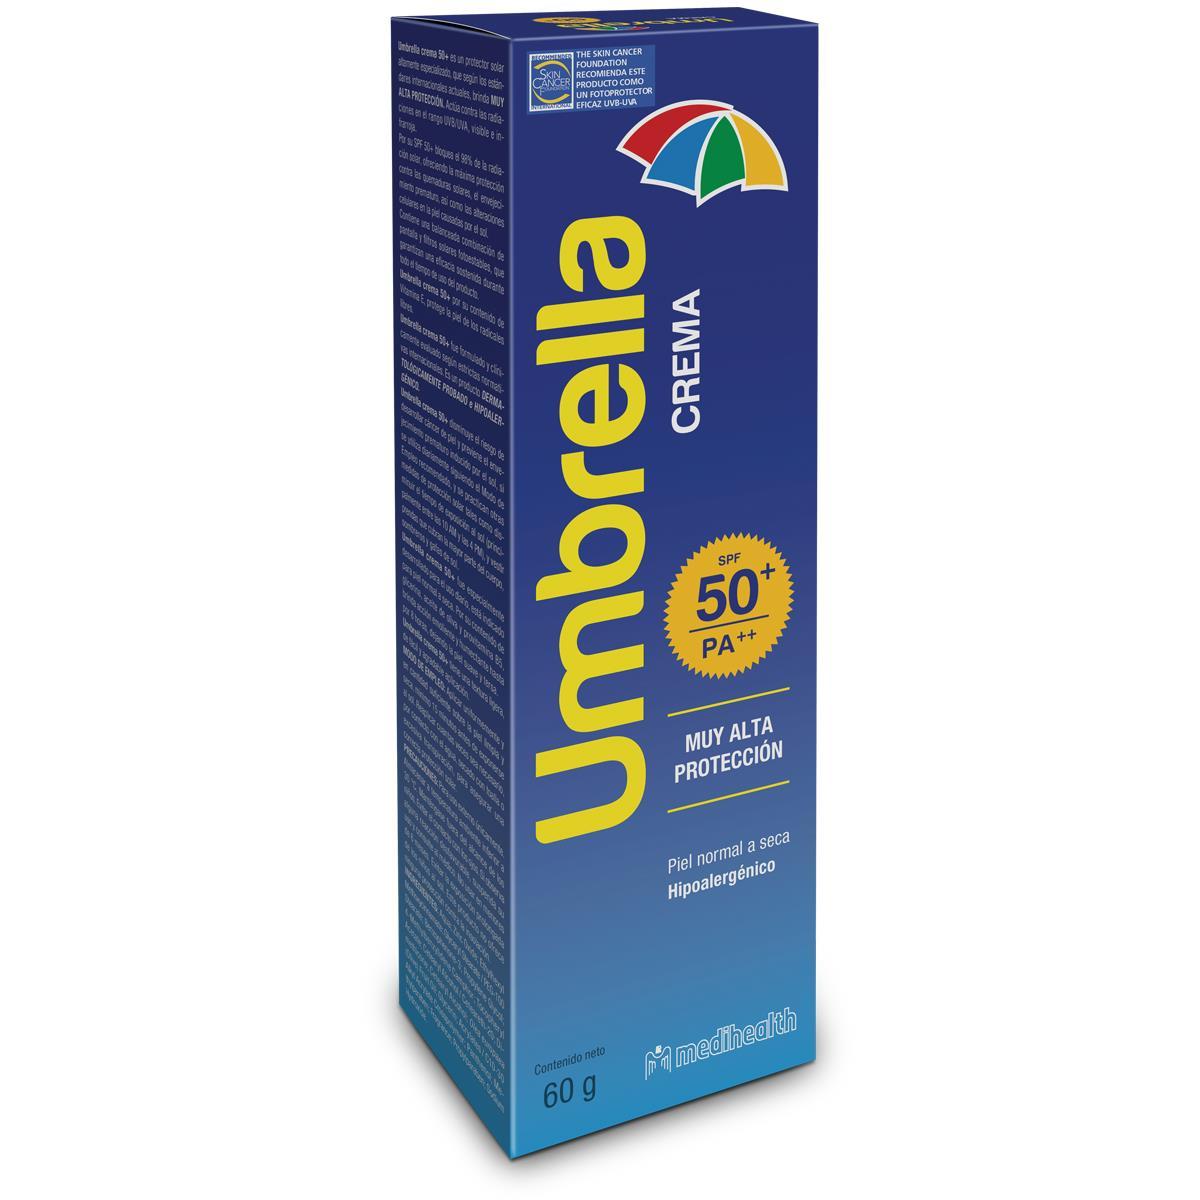 Comprar Umbrella 50+ 60 Gr 1 Tubo Crema